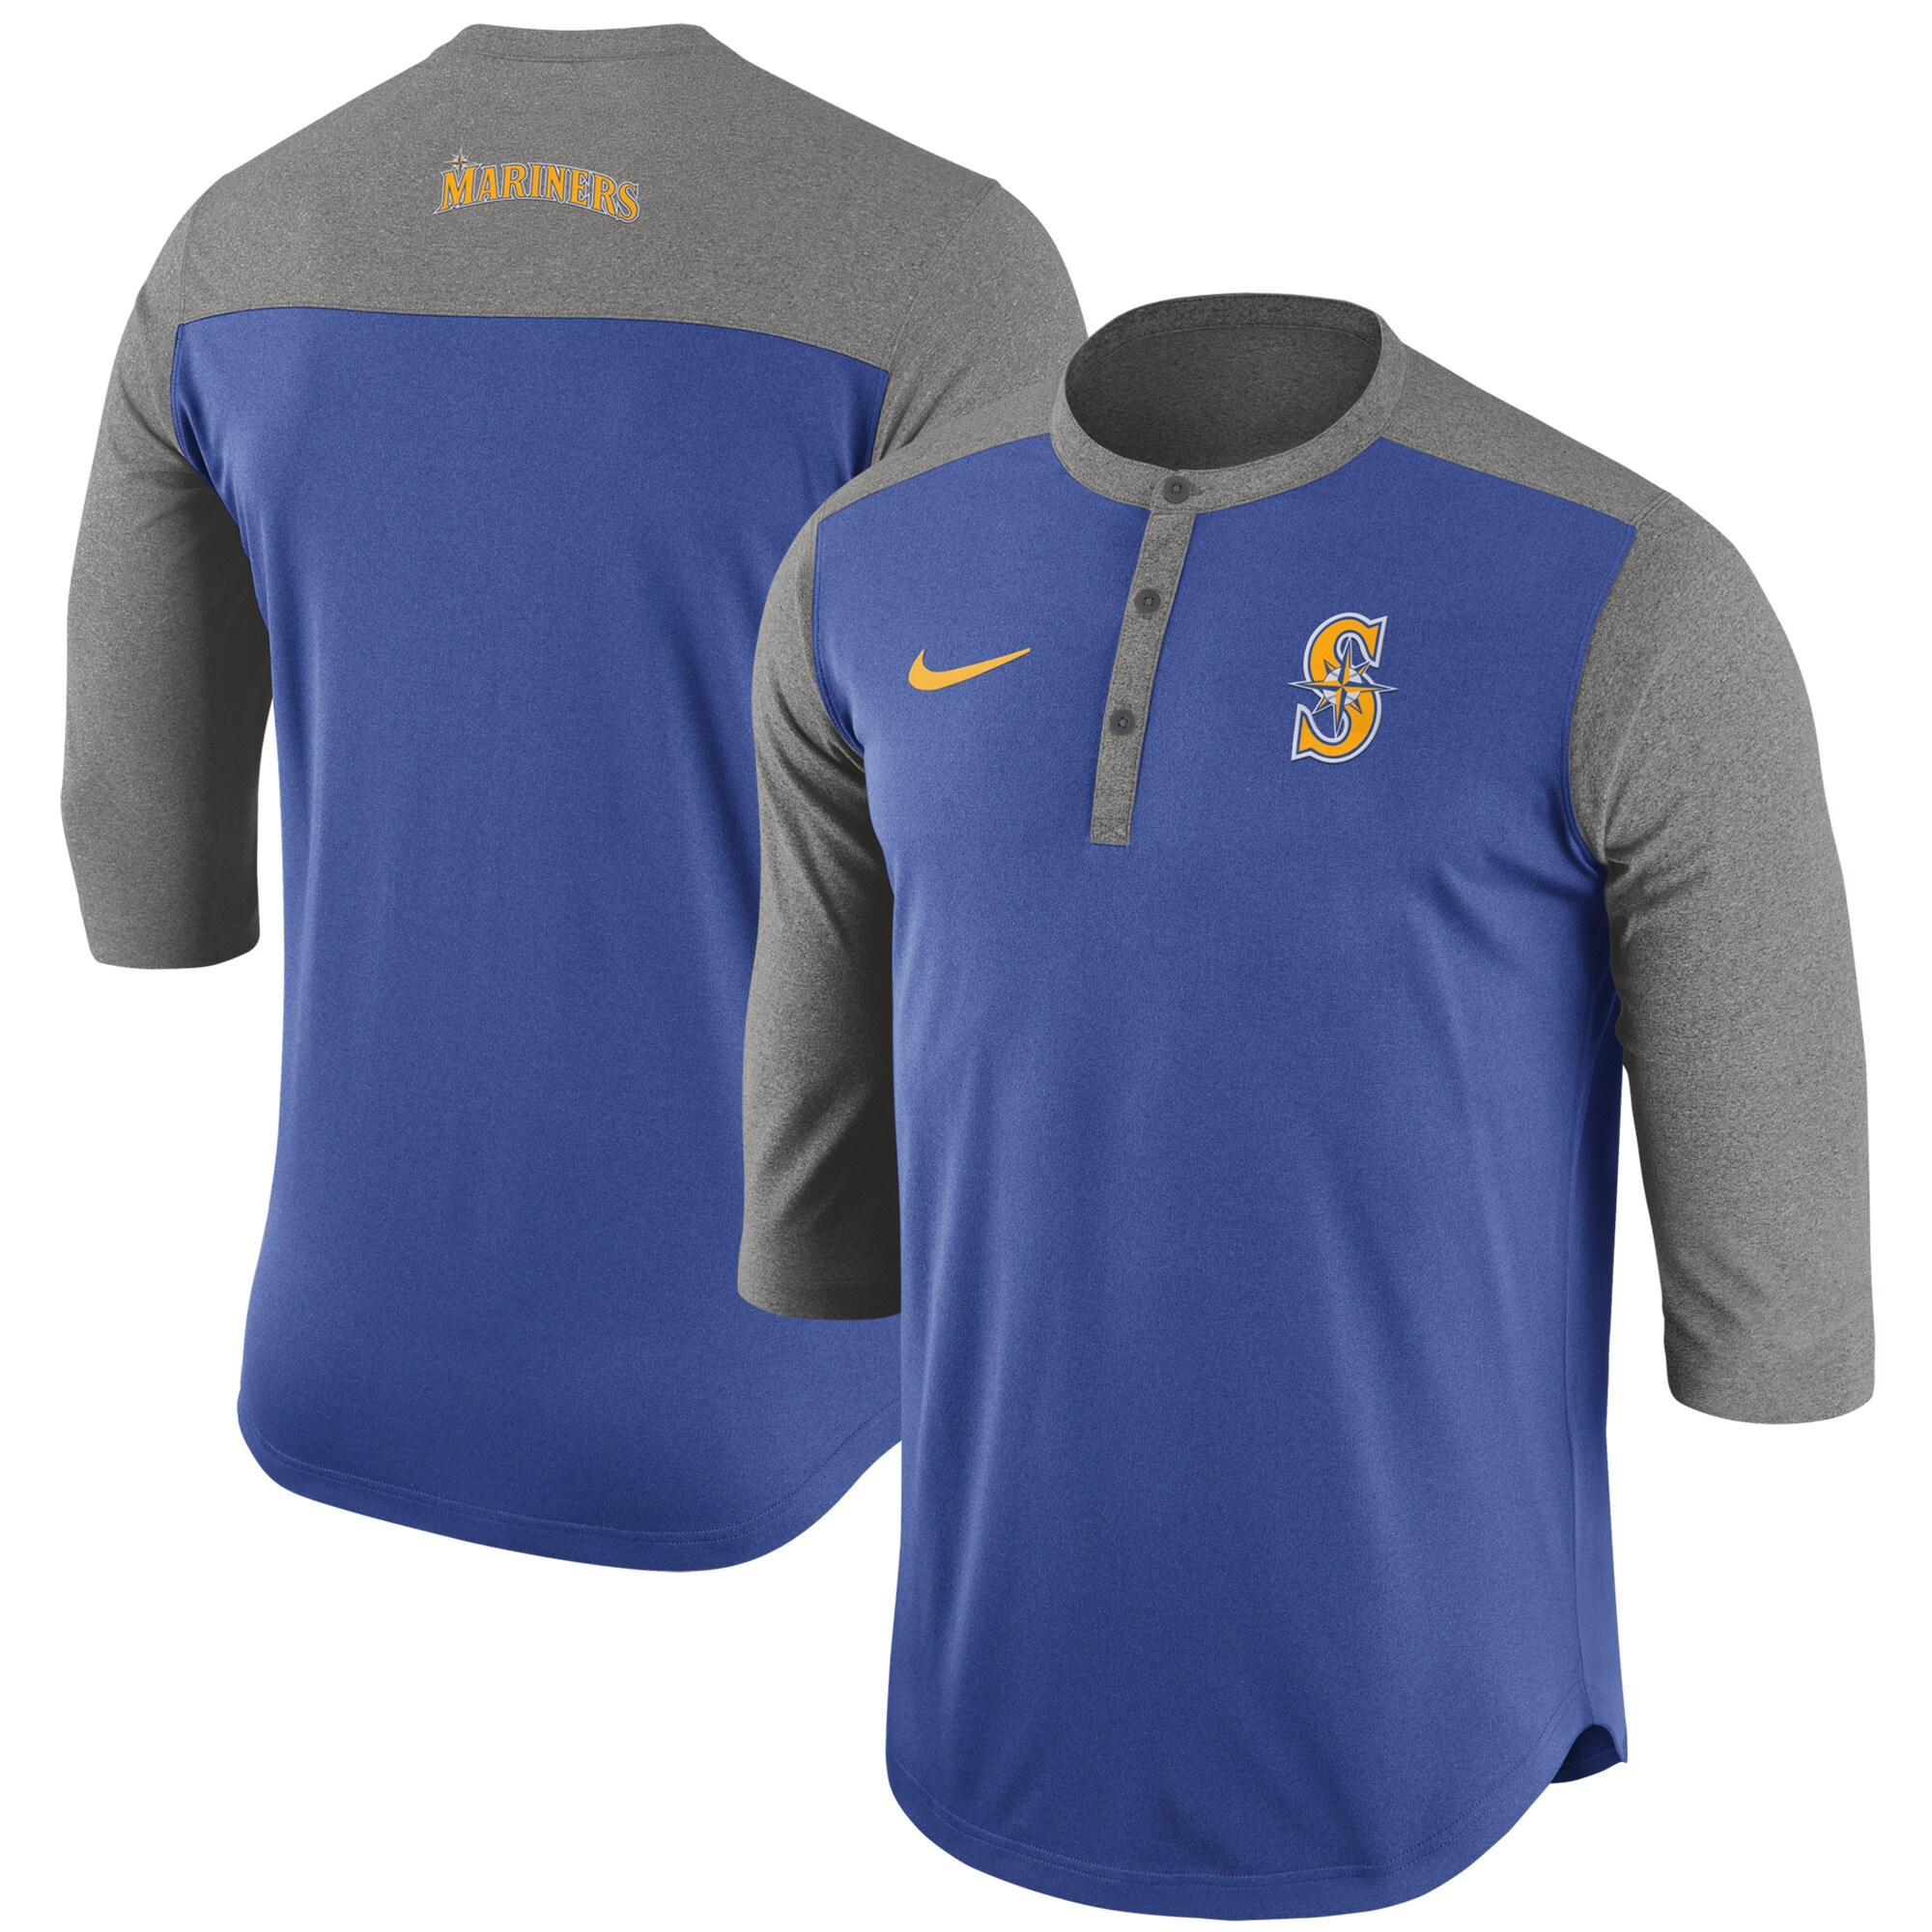 Seattle Mariners Nike Dry Henley 3/4-Sleeve T-Shirt - Royal